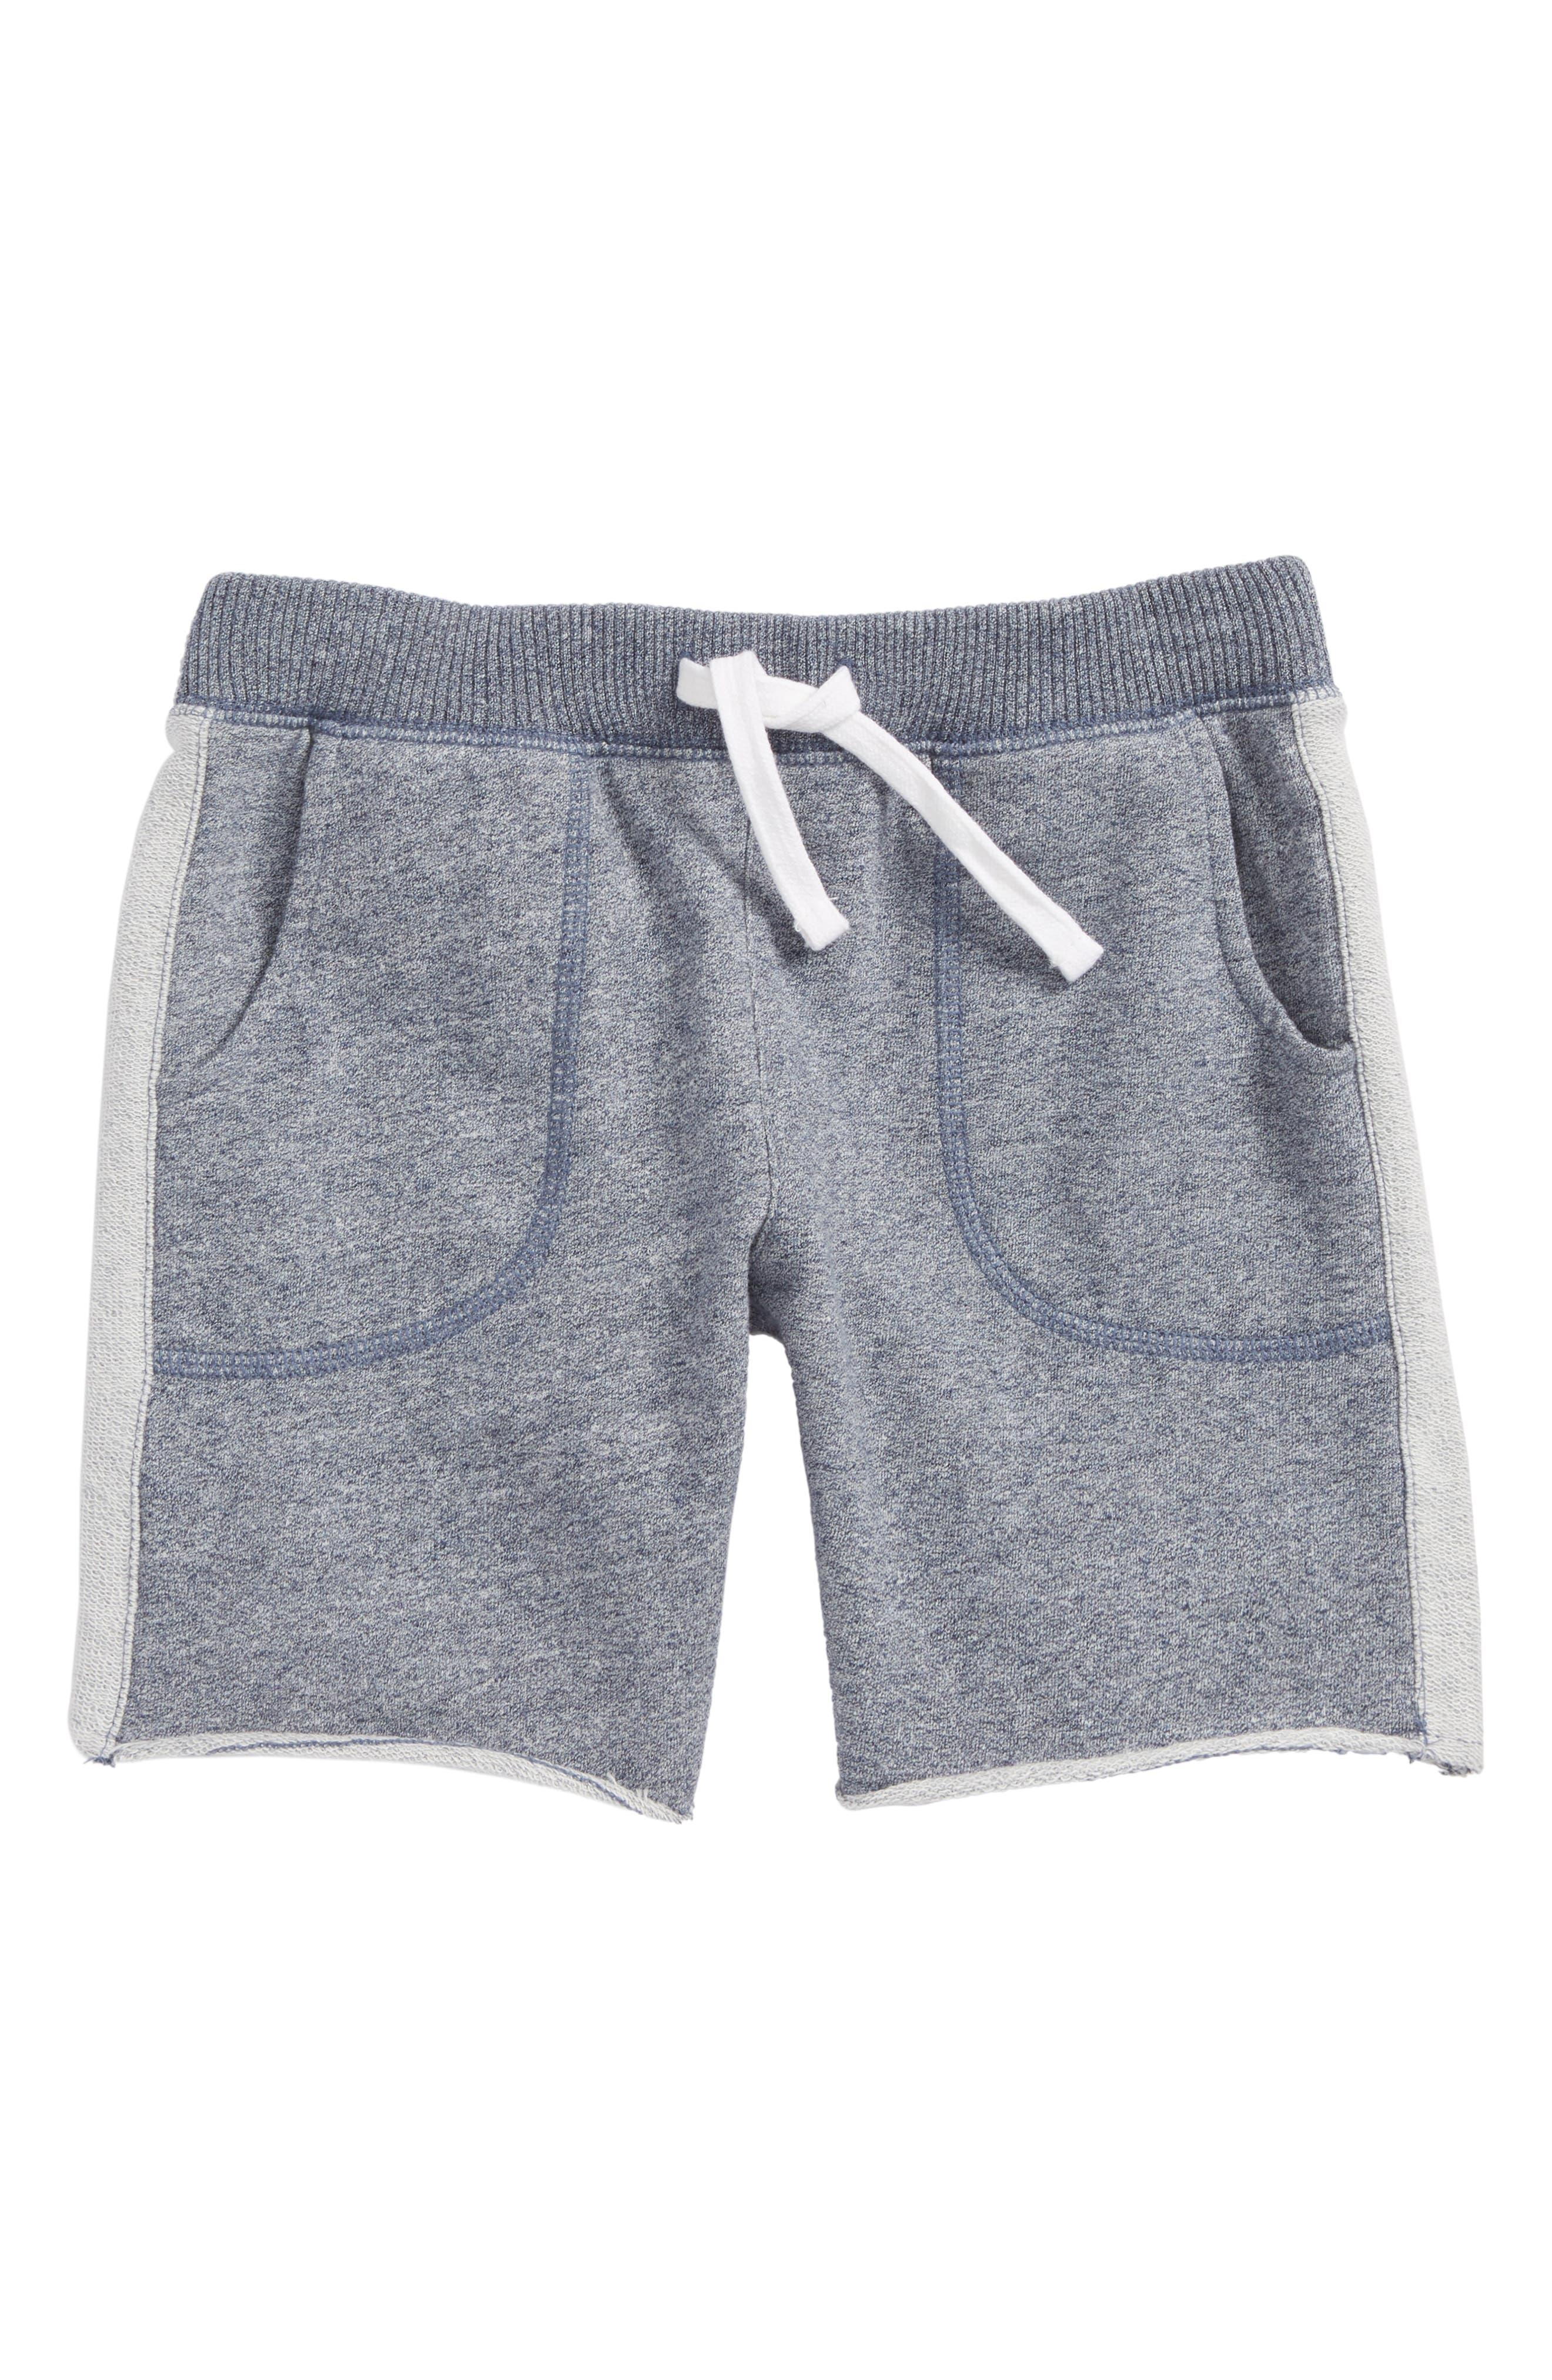 Fleece Shorts,                             Main thumbnail 1, color,                             Navy Denim